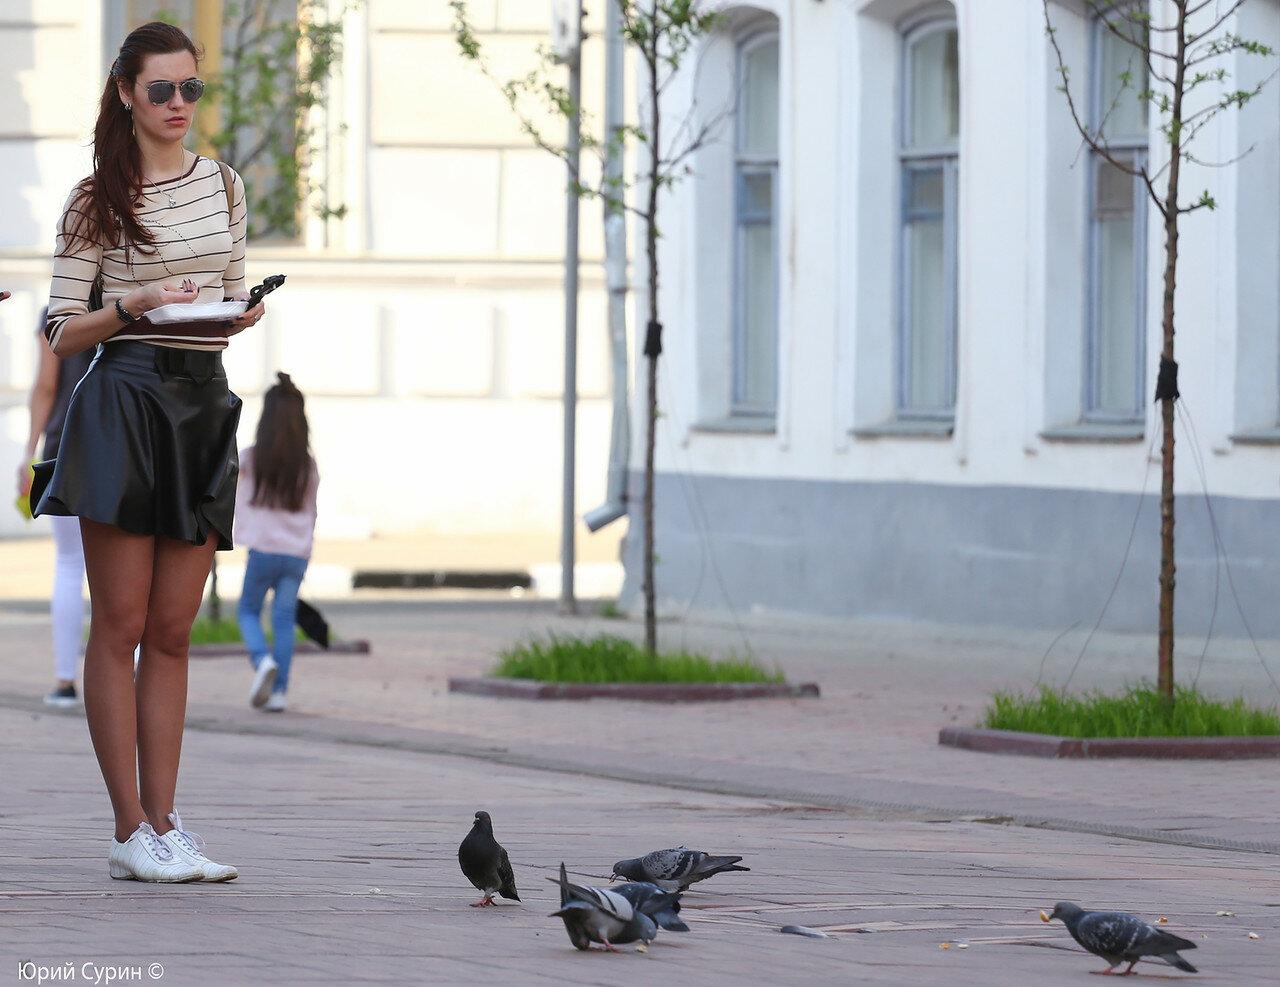 слежка девушек на улицах видео фото